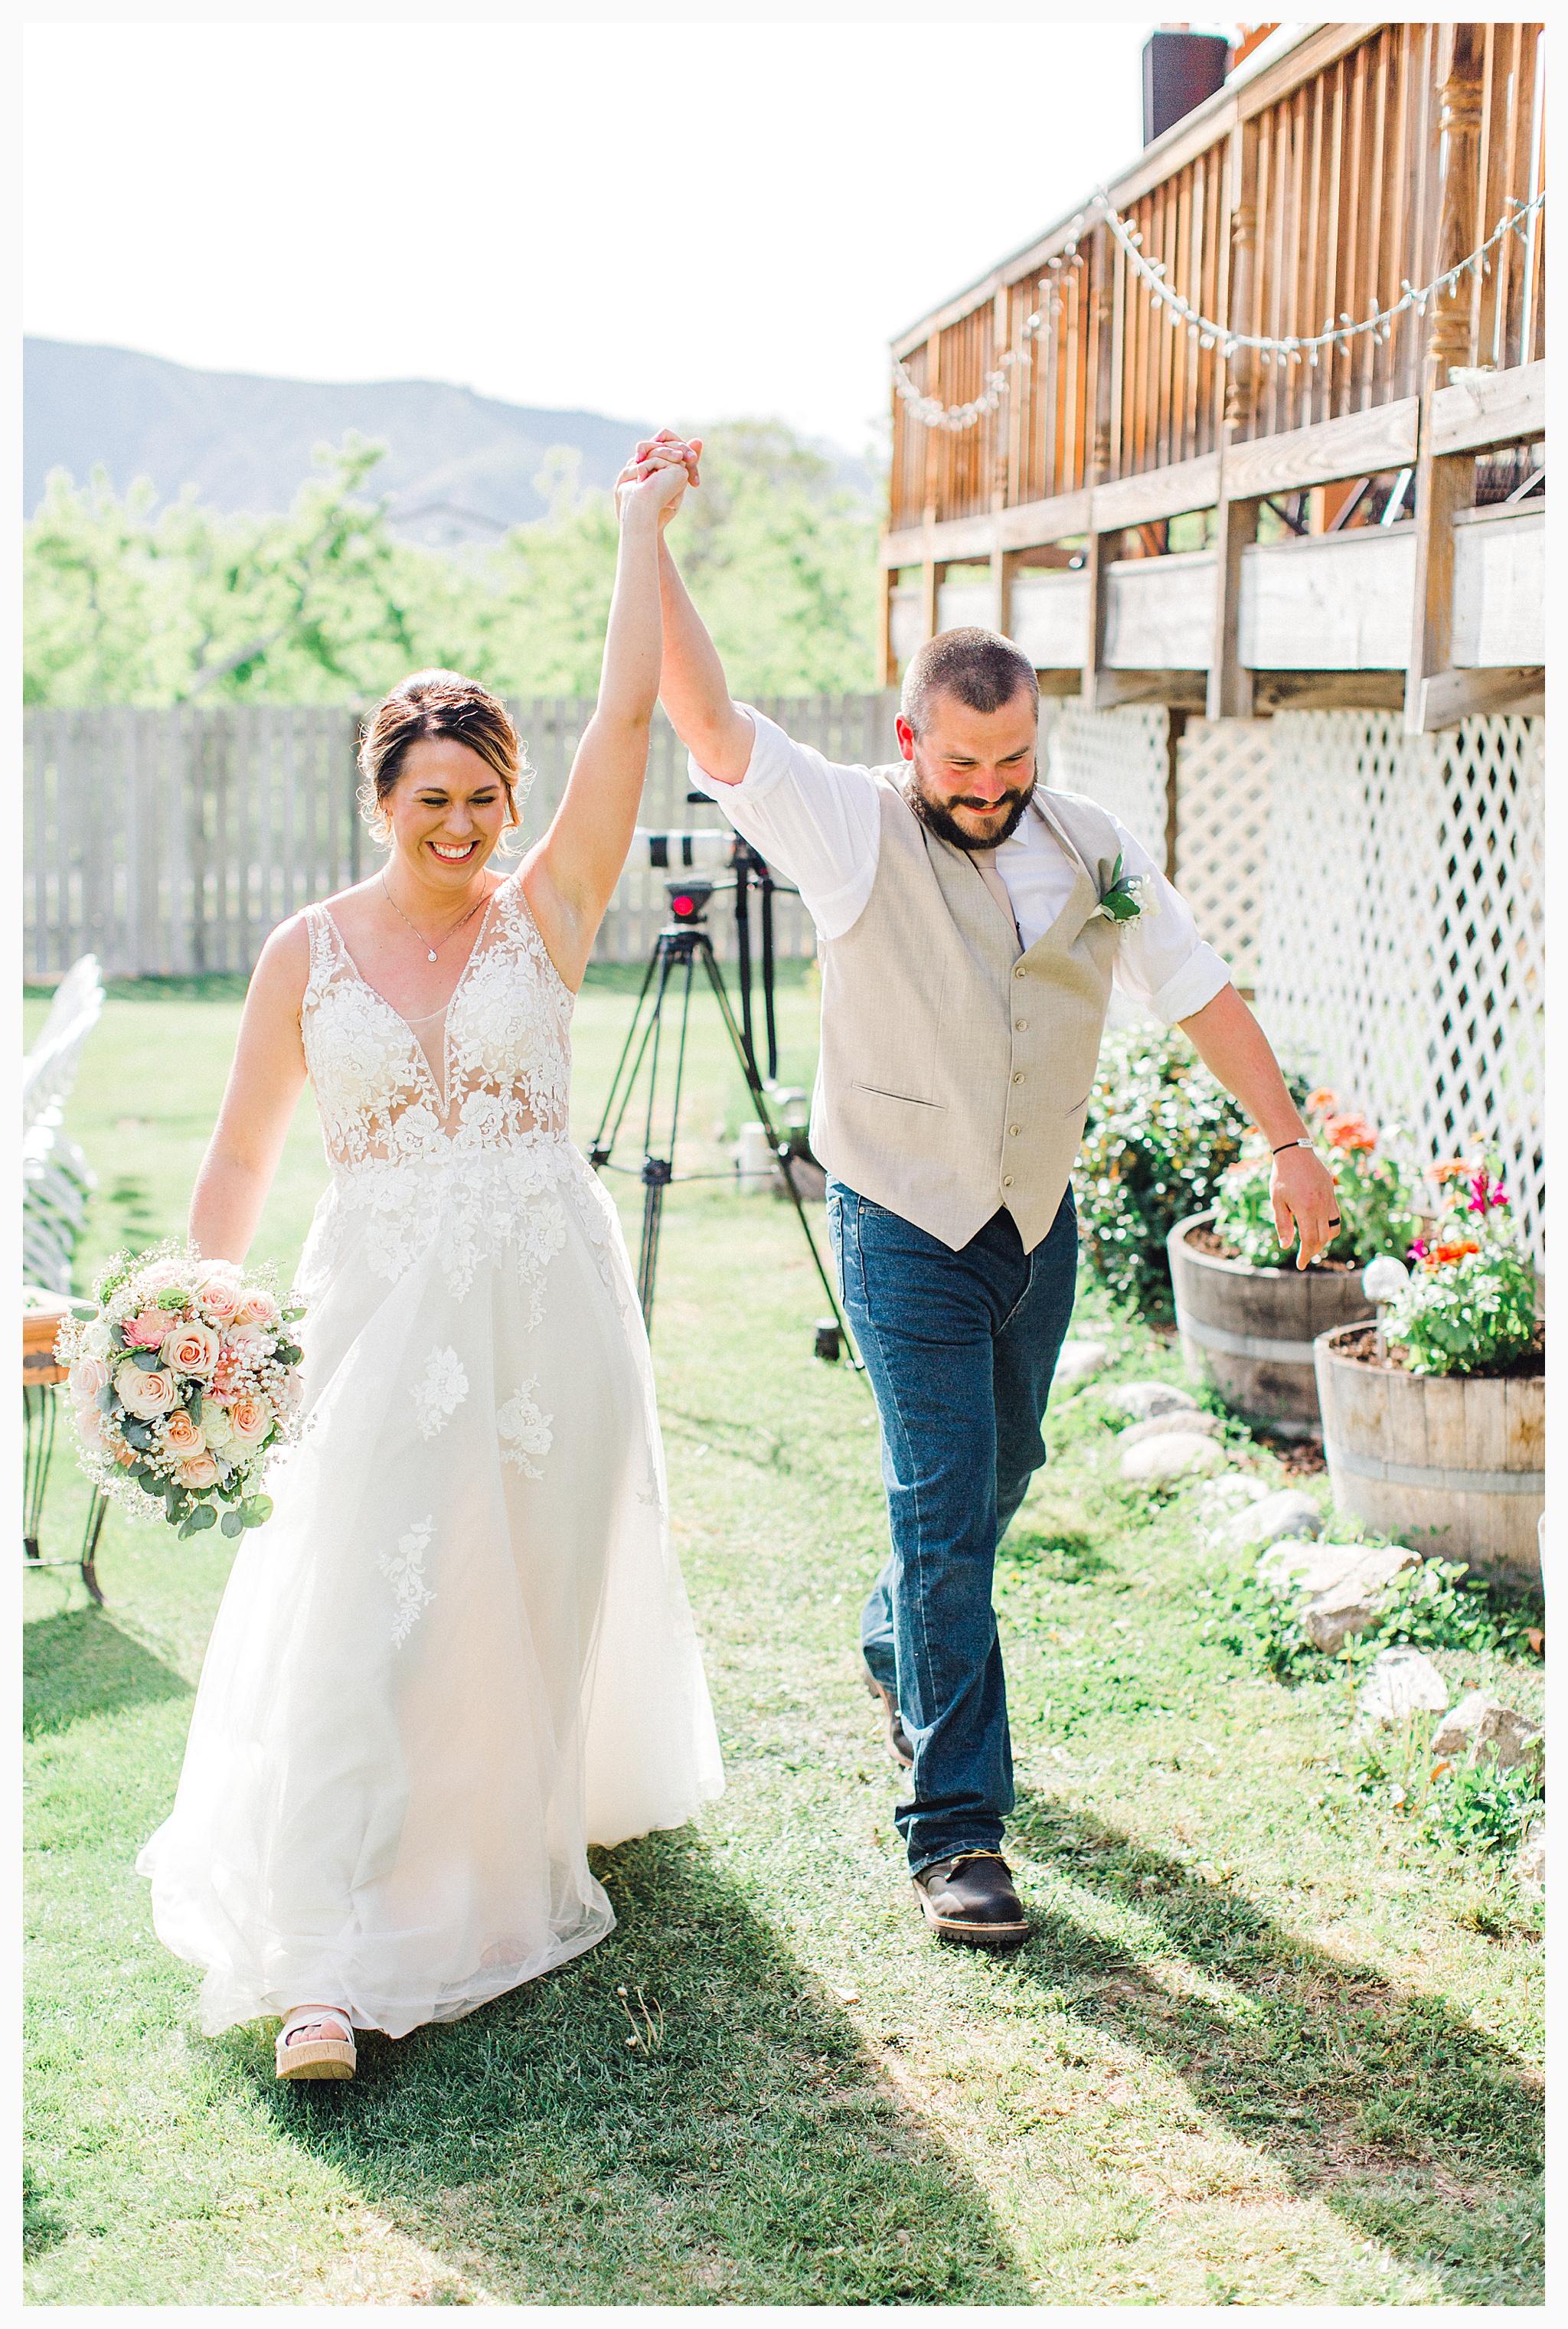 Rustic barn wedding in Wenatchee Washington at Sunshine Ranch on Easy Street, Emma Rose Company Seattle PNW Light and Airy Wedding Photographer_0069.jpg